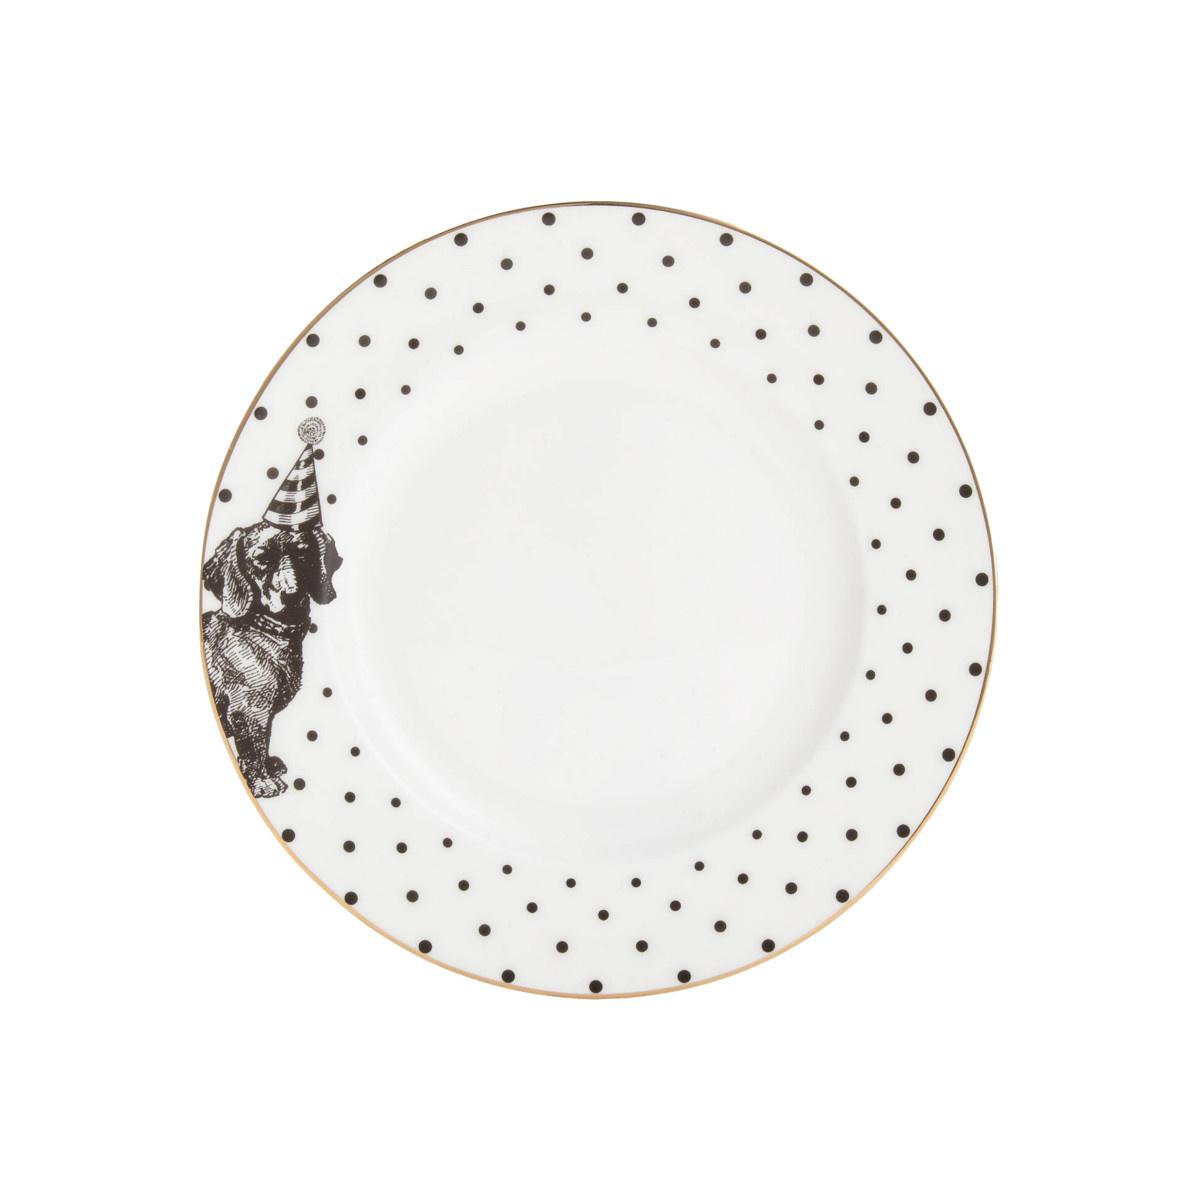 Yvonne Ellen London Monochrome Set of 2 Plates Ø 16 cm - Sausage Dog - Bone China